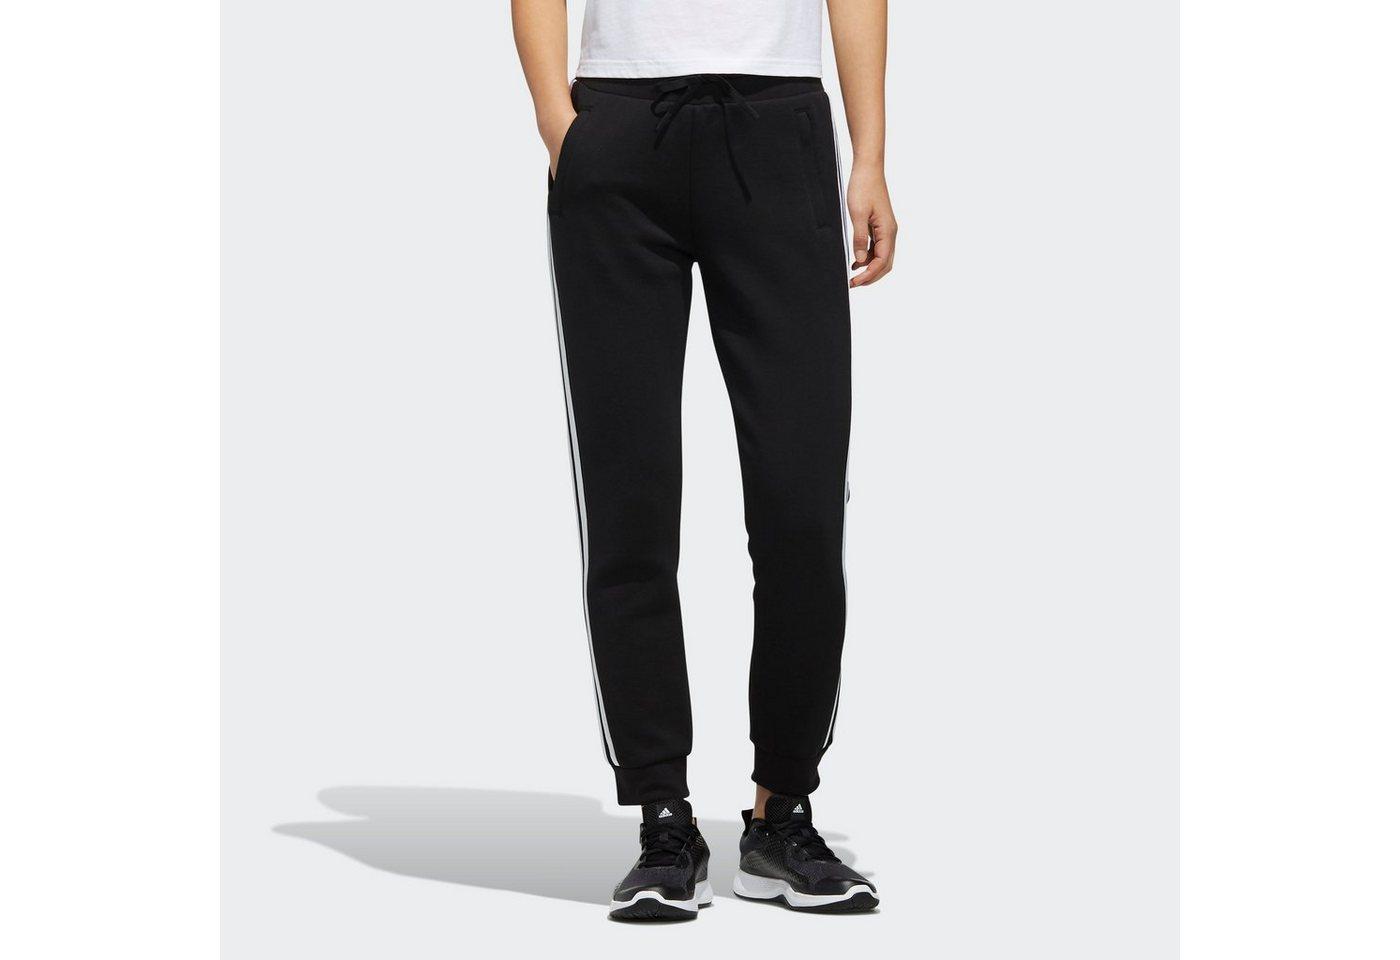 adidas performance -  Jogginghose »MH PANT DK 3 STRIPES«